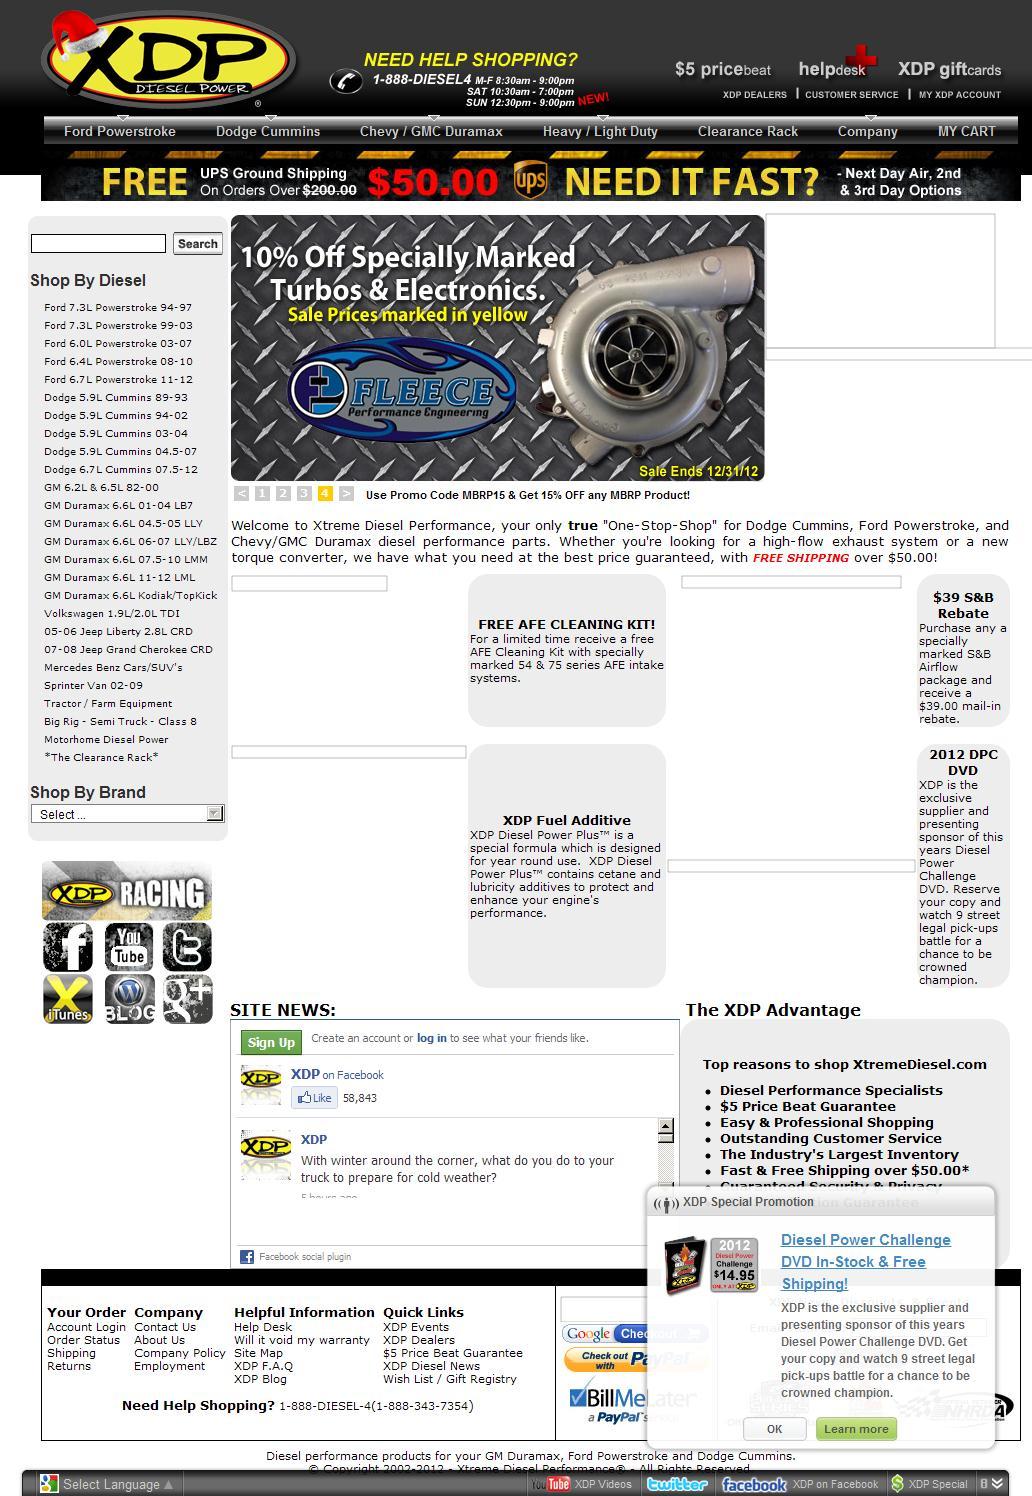 Xtreme Diesel Performance - XDP Diesel Power Performance Parts